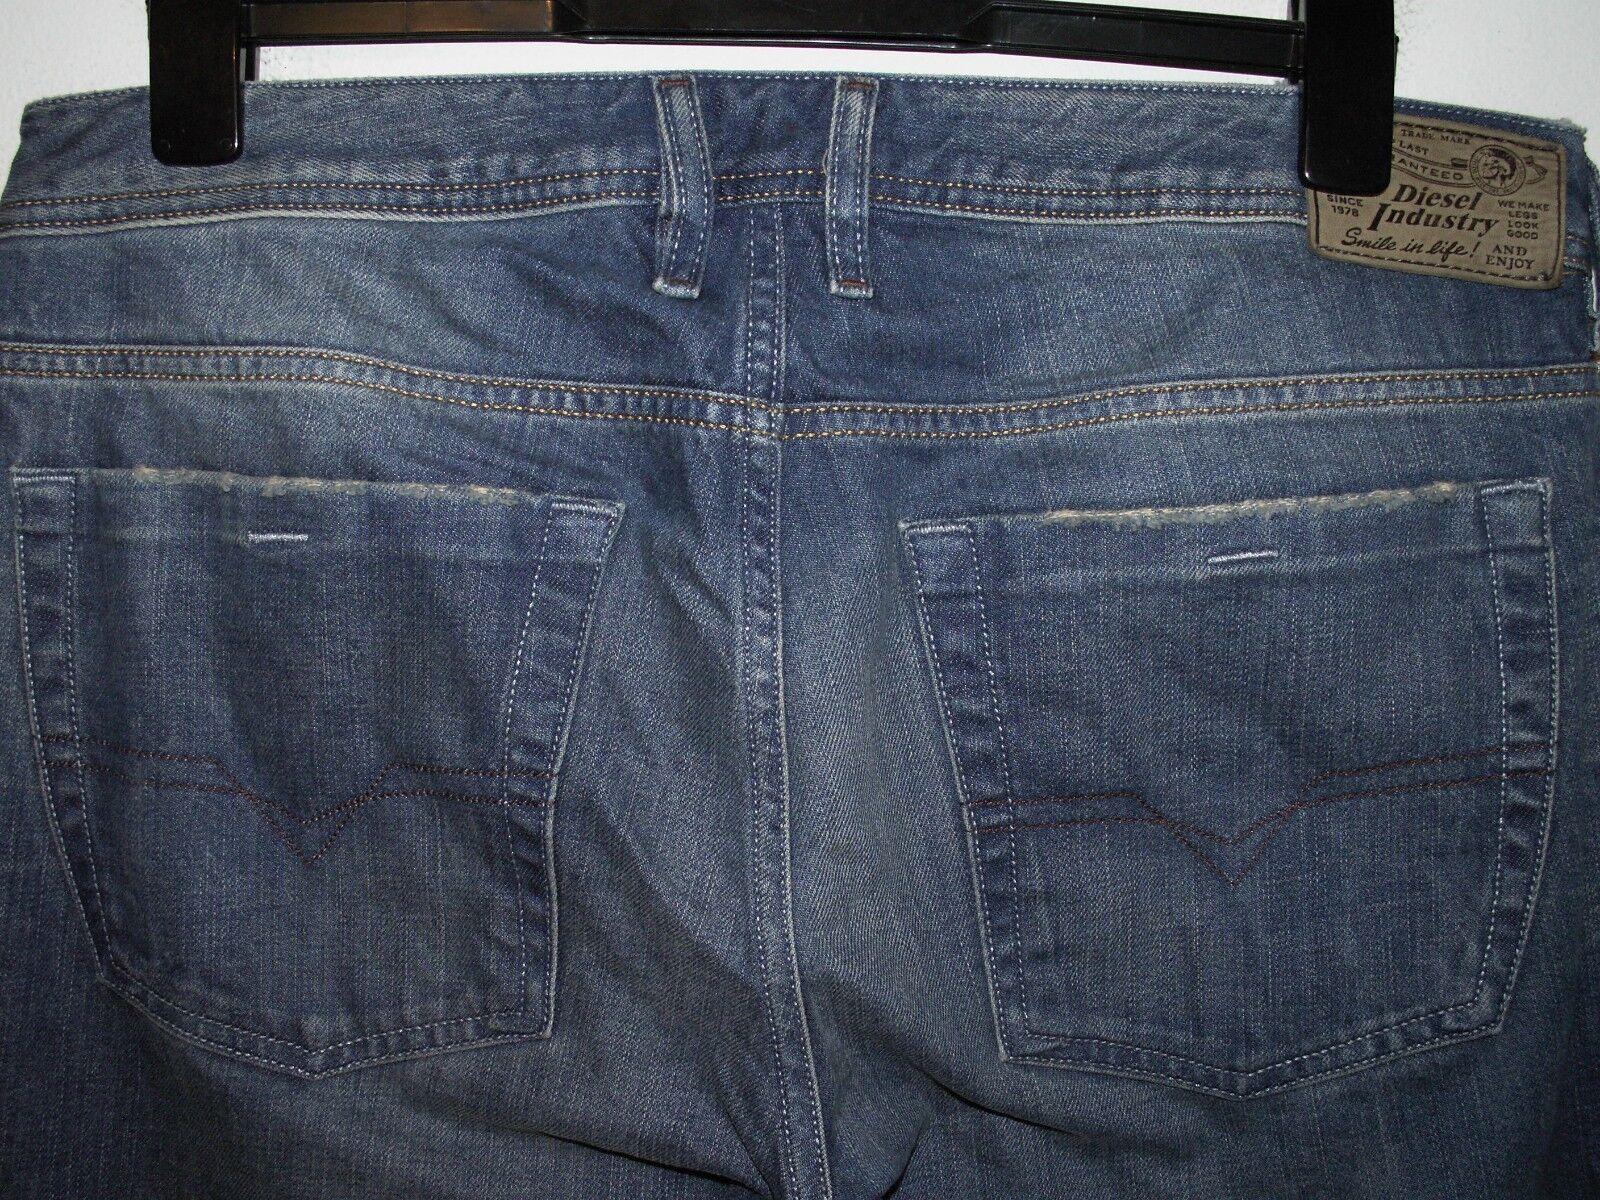 Diesel zathan Stiefelcut jeans wash 0802E W34 L34 (a4003)